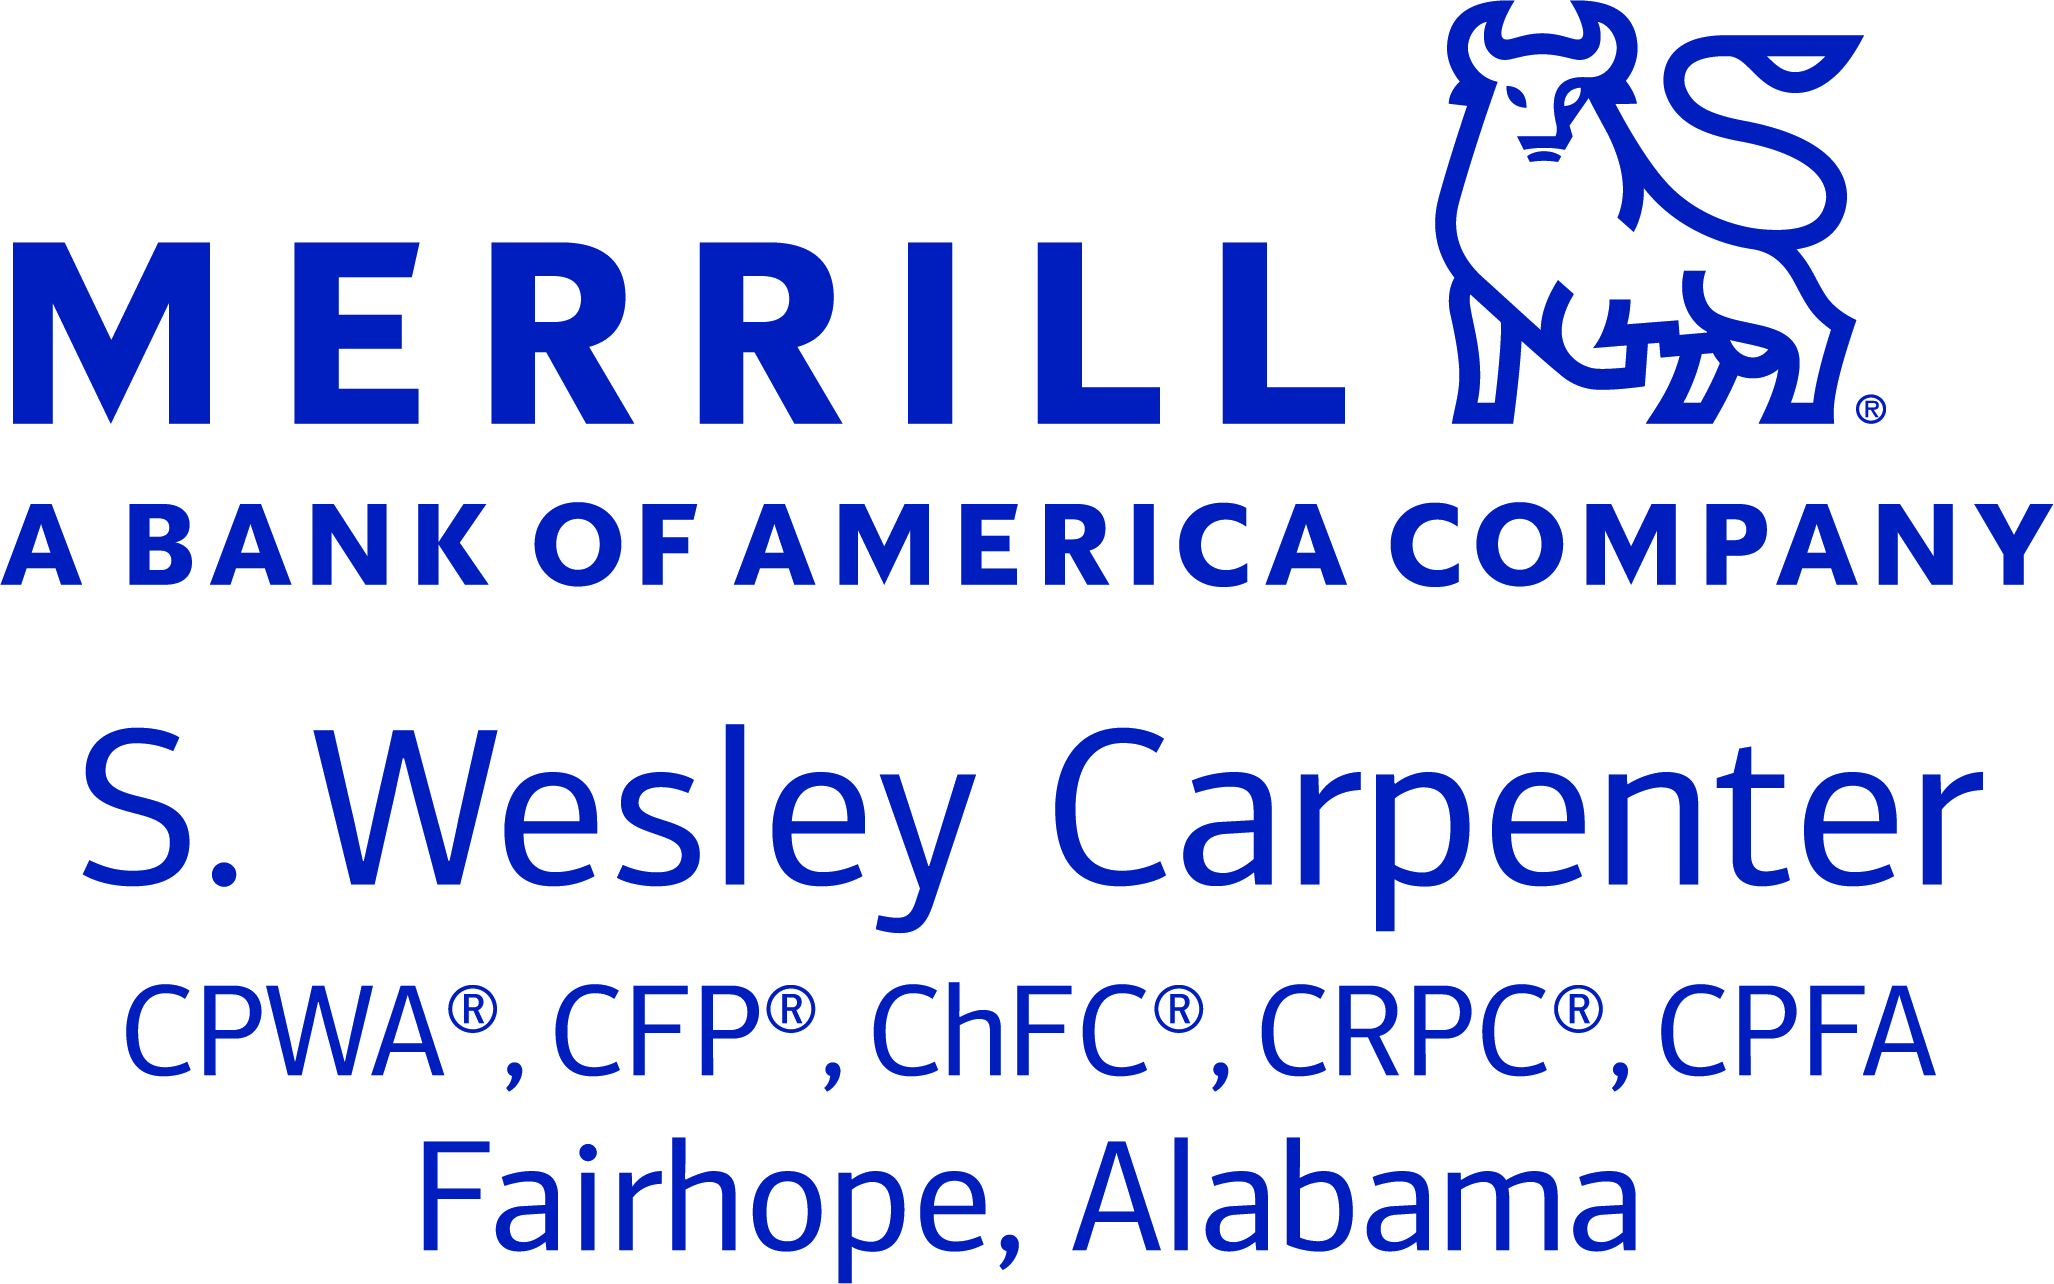 2019 S. Wesley Carpenter Logo.jpg